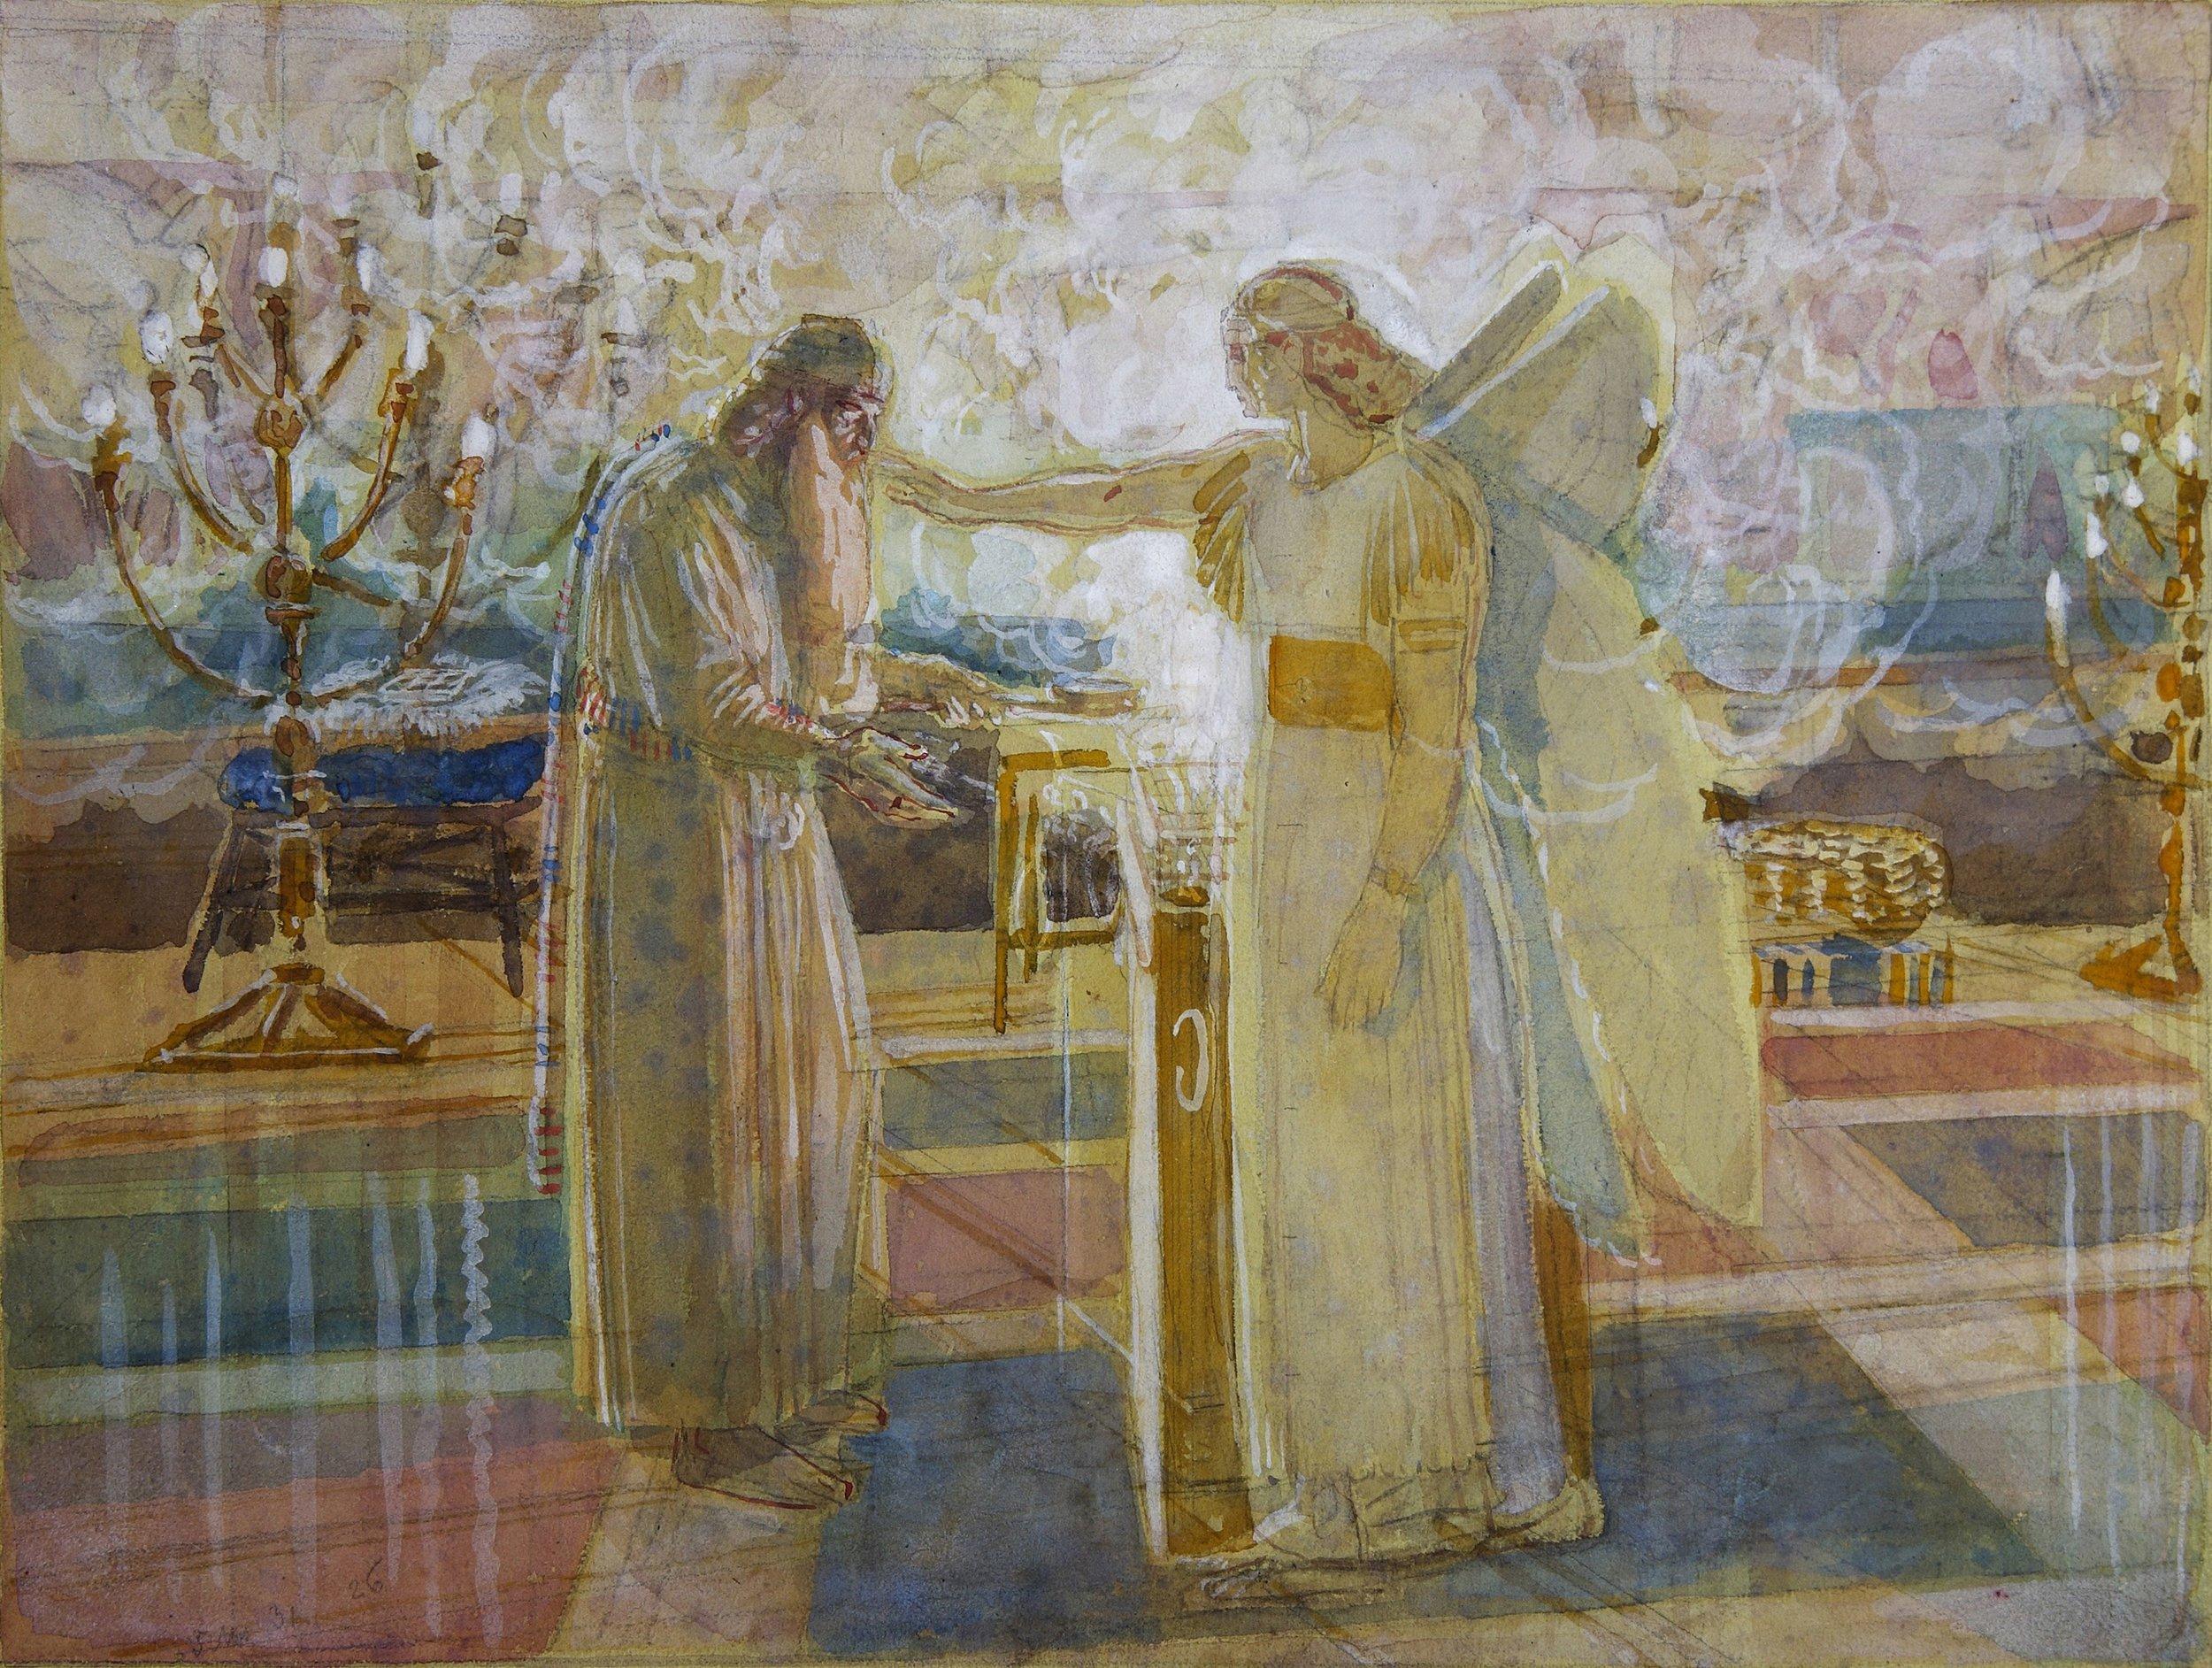 an angel, the archangel Gabriel, strikes Zechariah dumb in the temple as depicted in Luke 1